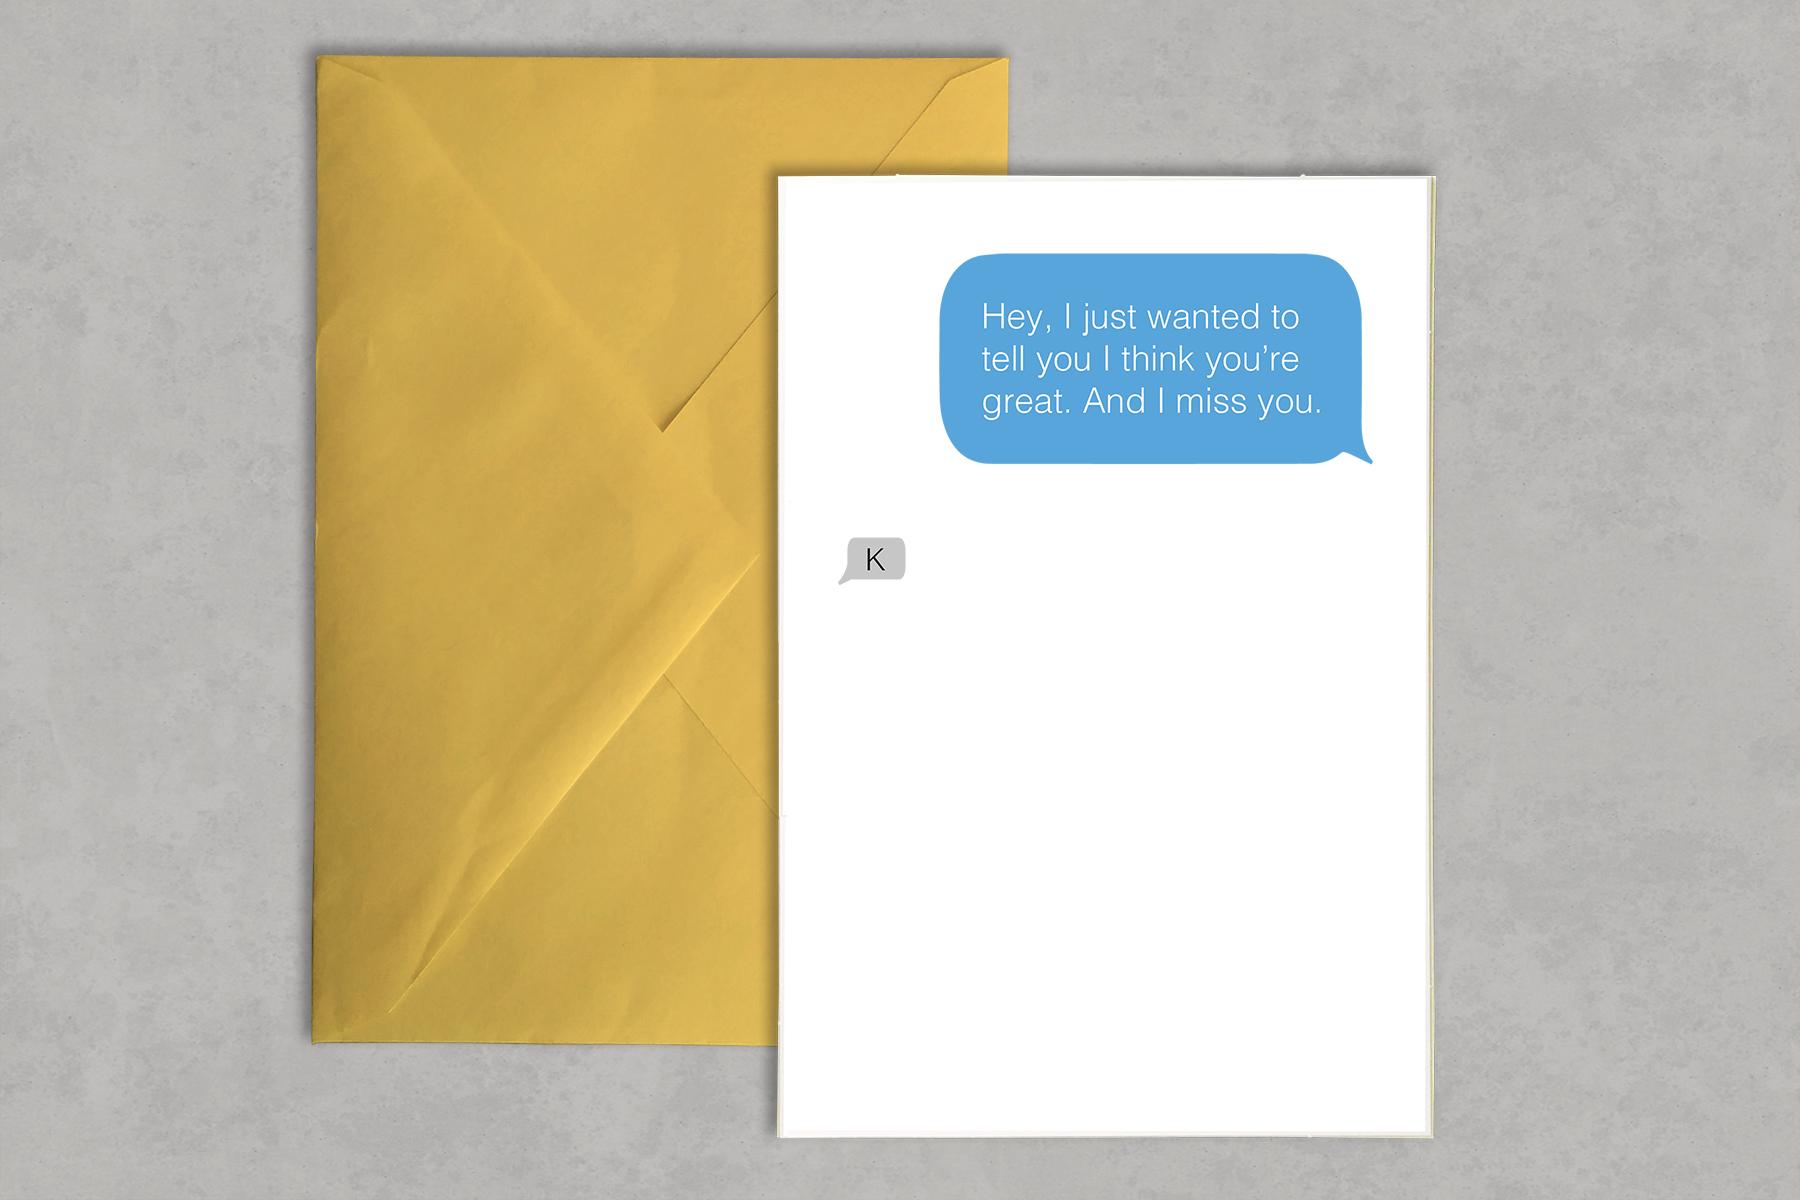 greeting_card_textcard.jpg